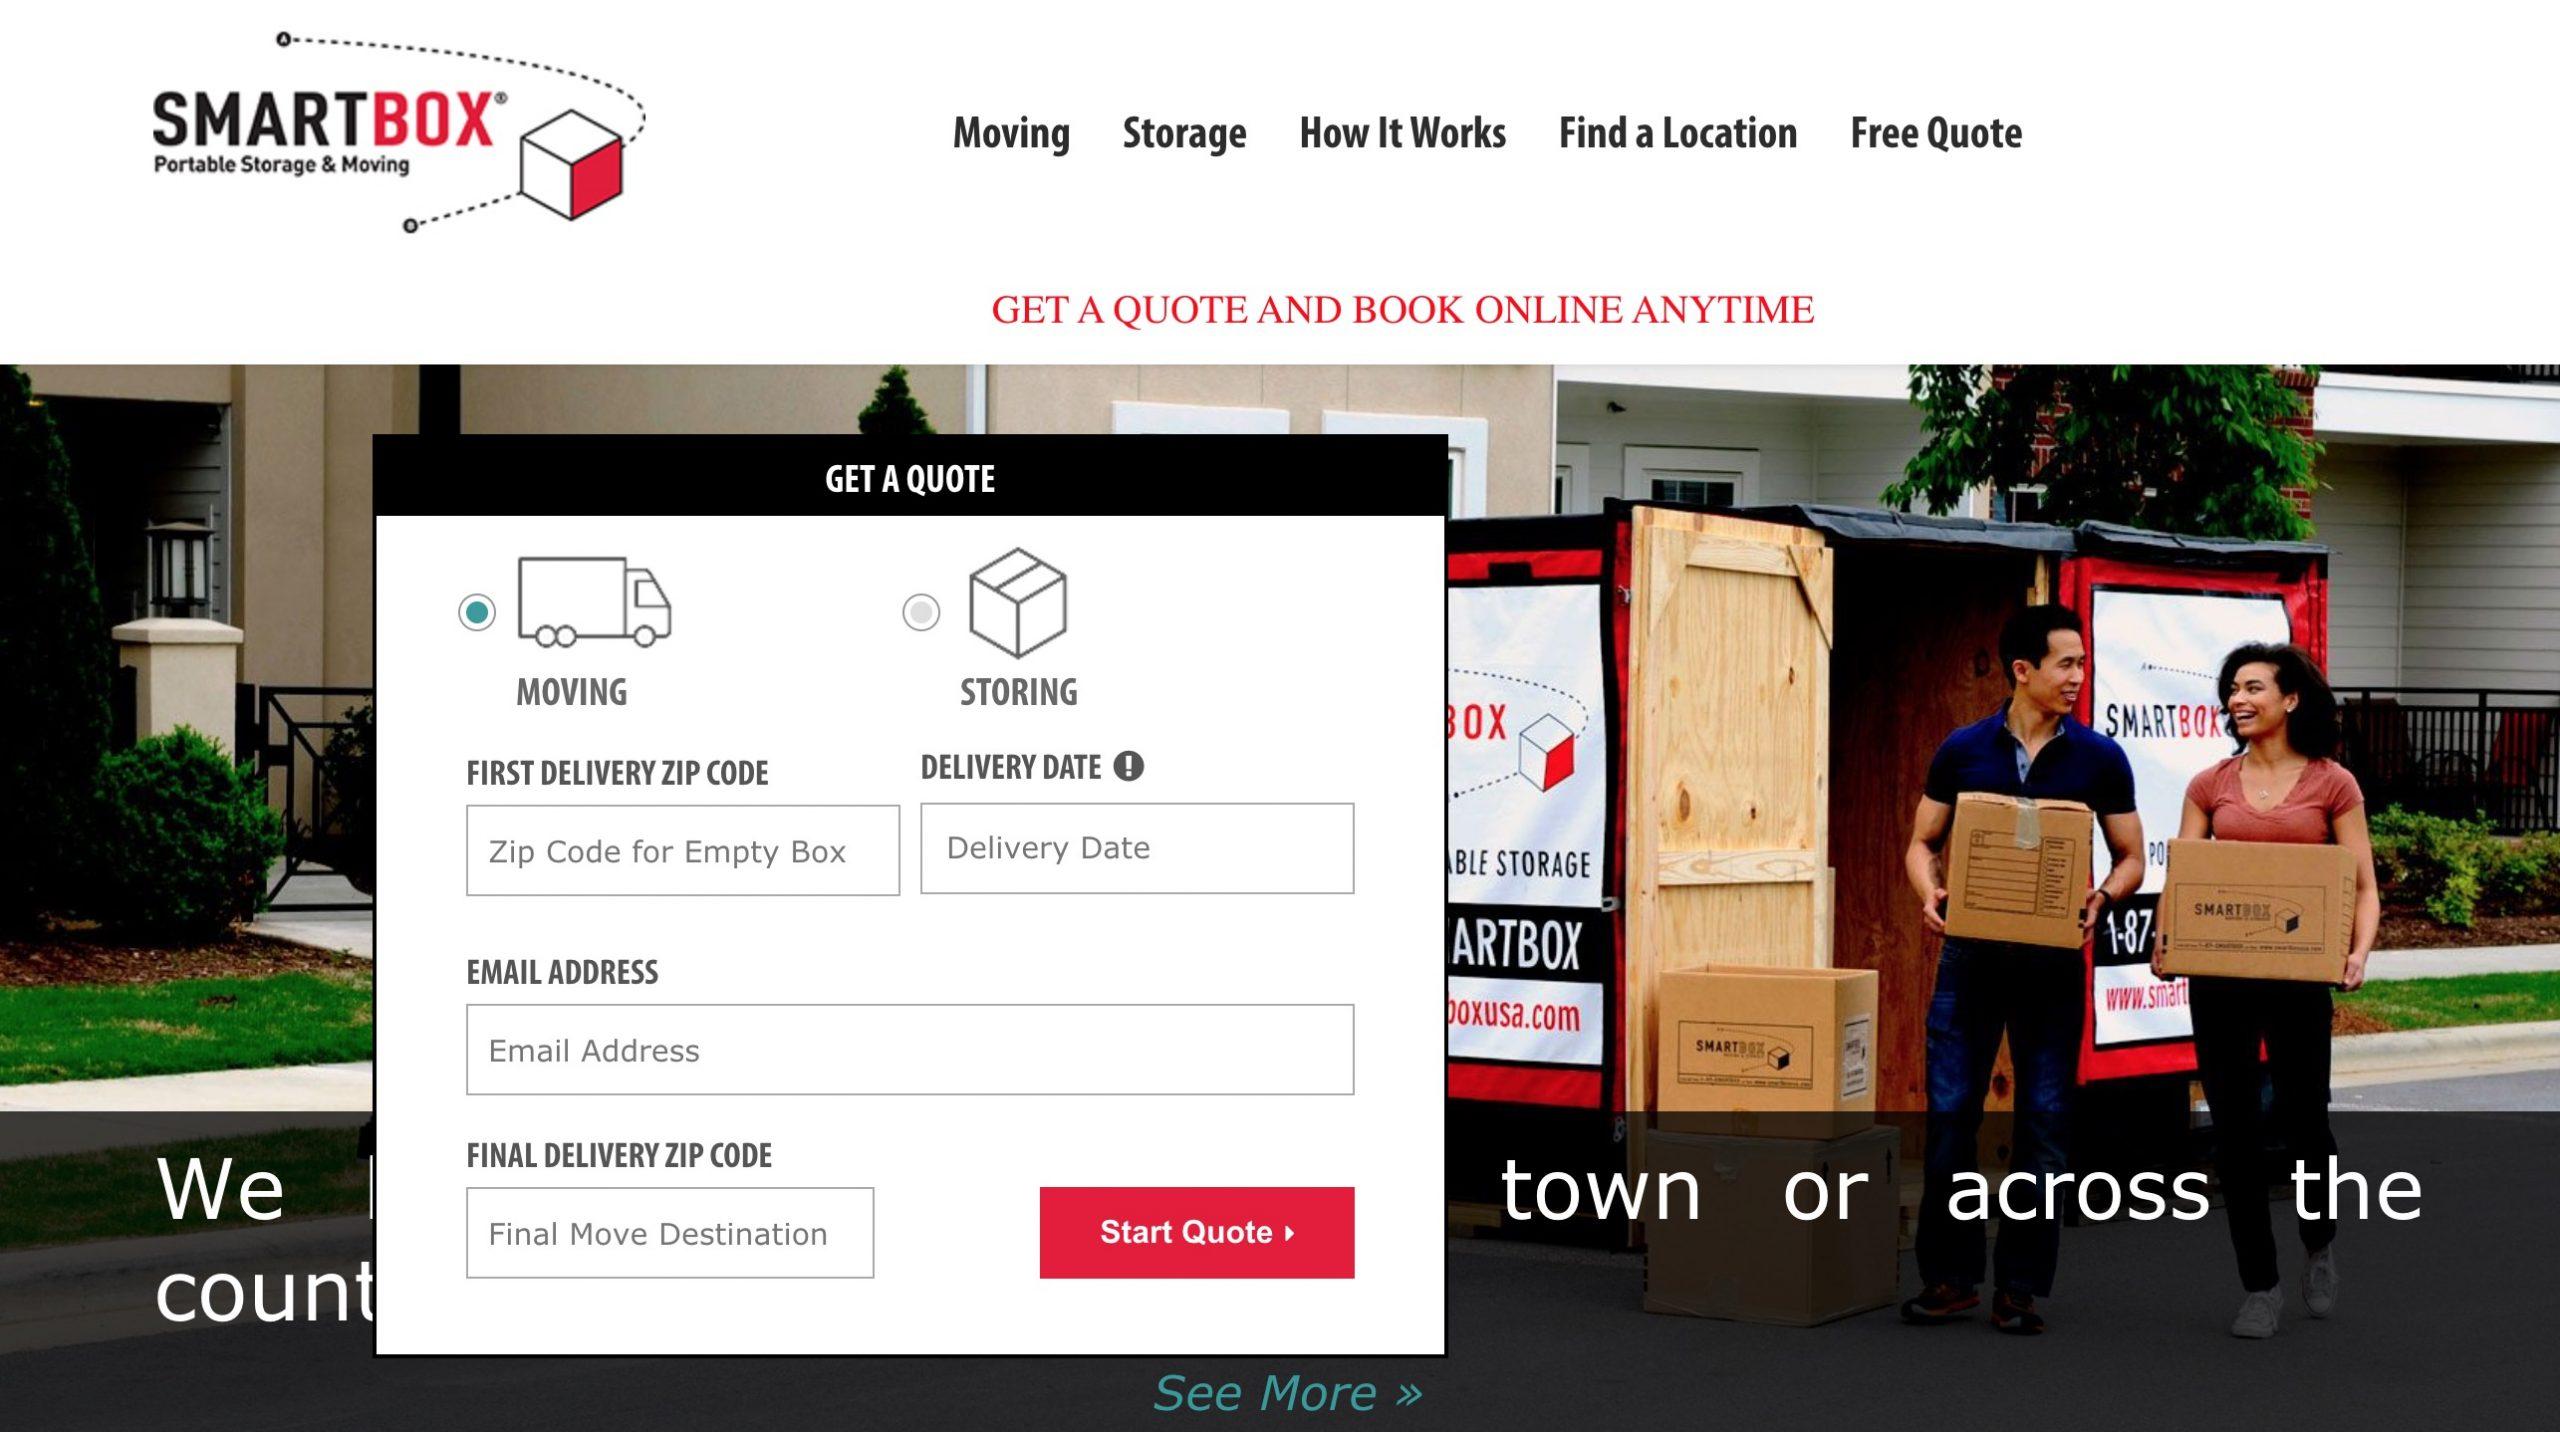 smartbox moving main page